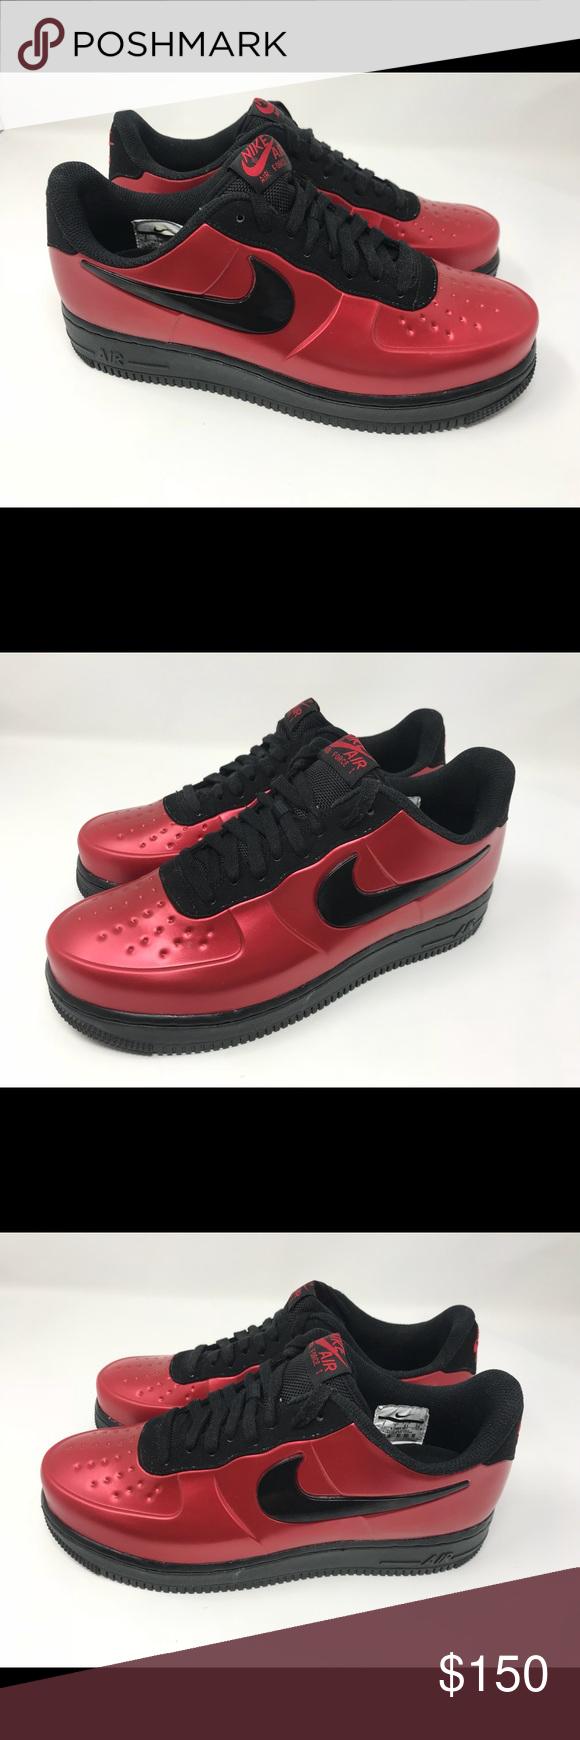 27557cc5ea8 NEW MEN S NIKE AIR FORCE 1 FOAMPOSITE PRO Sz 8 NEW MEN S NIKE AIR FORCE 1  FOAMPOSITE PRO CUP GYM RED BLACK Sz 8 Nike Shoes Sneakers